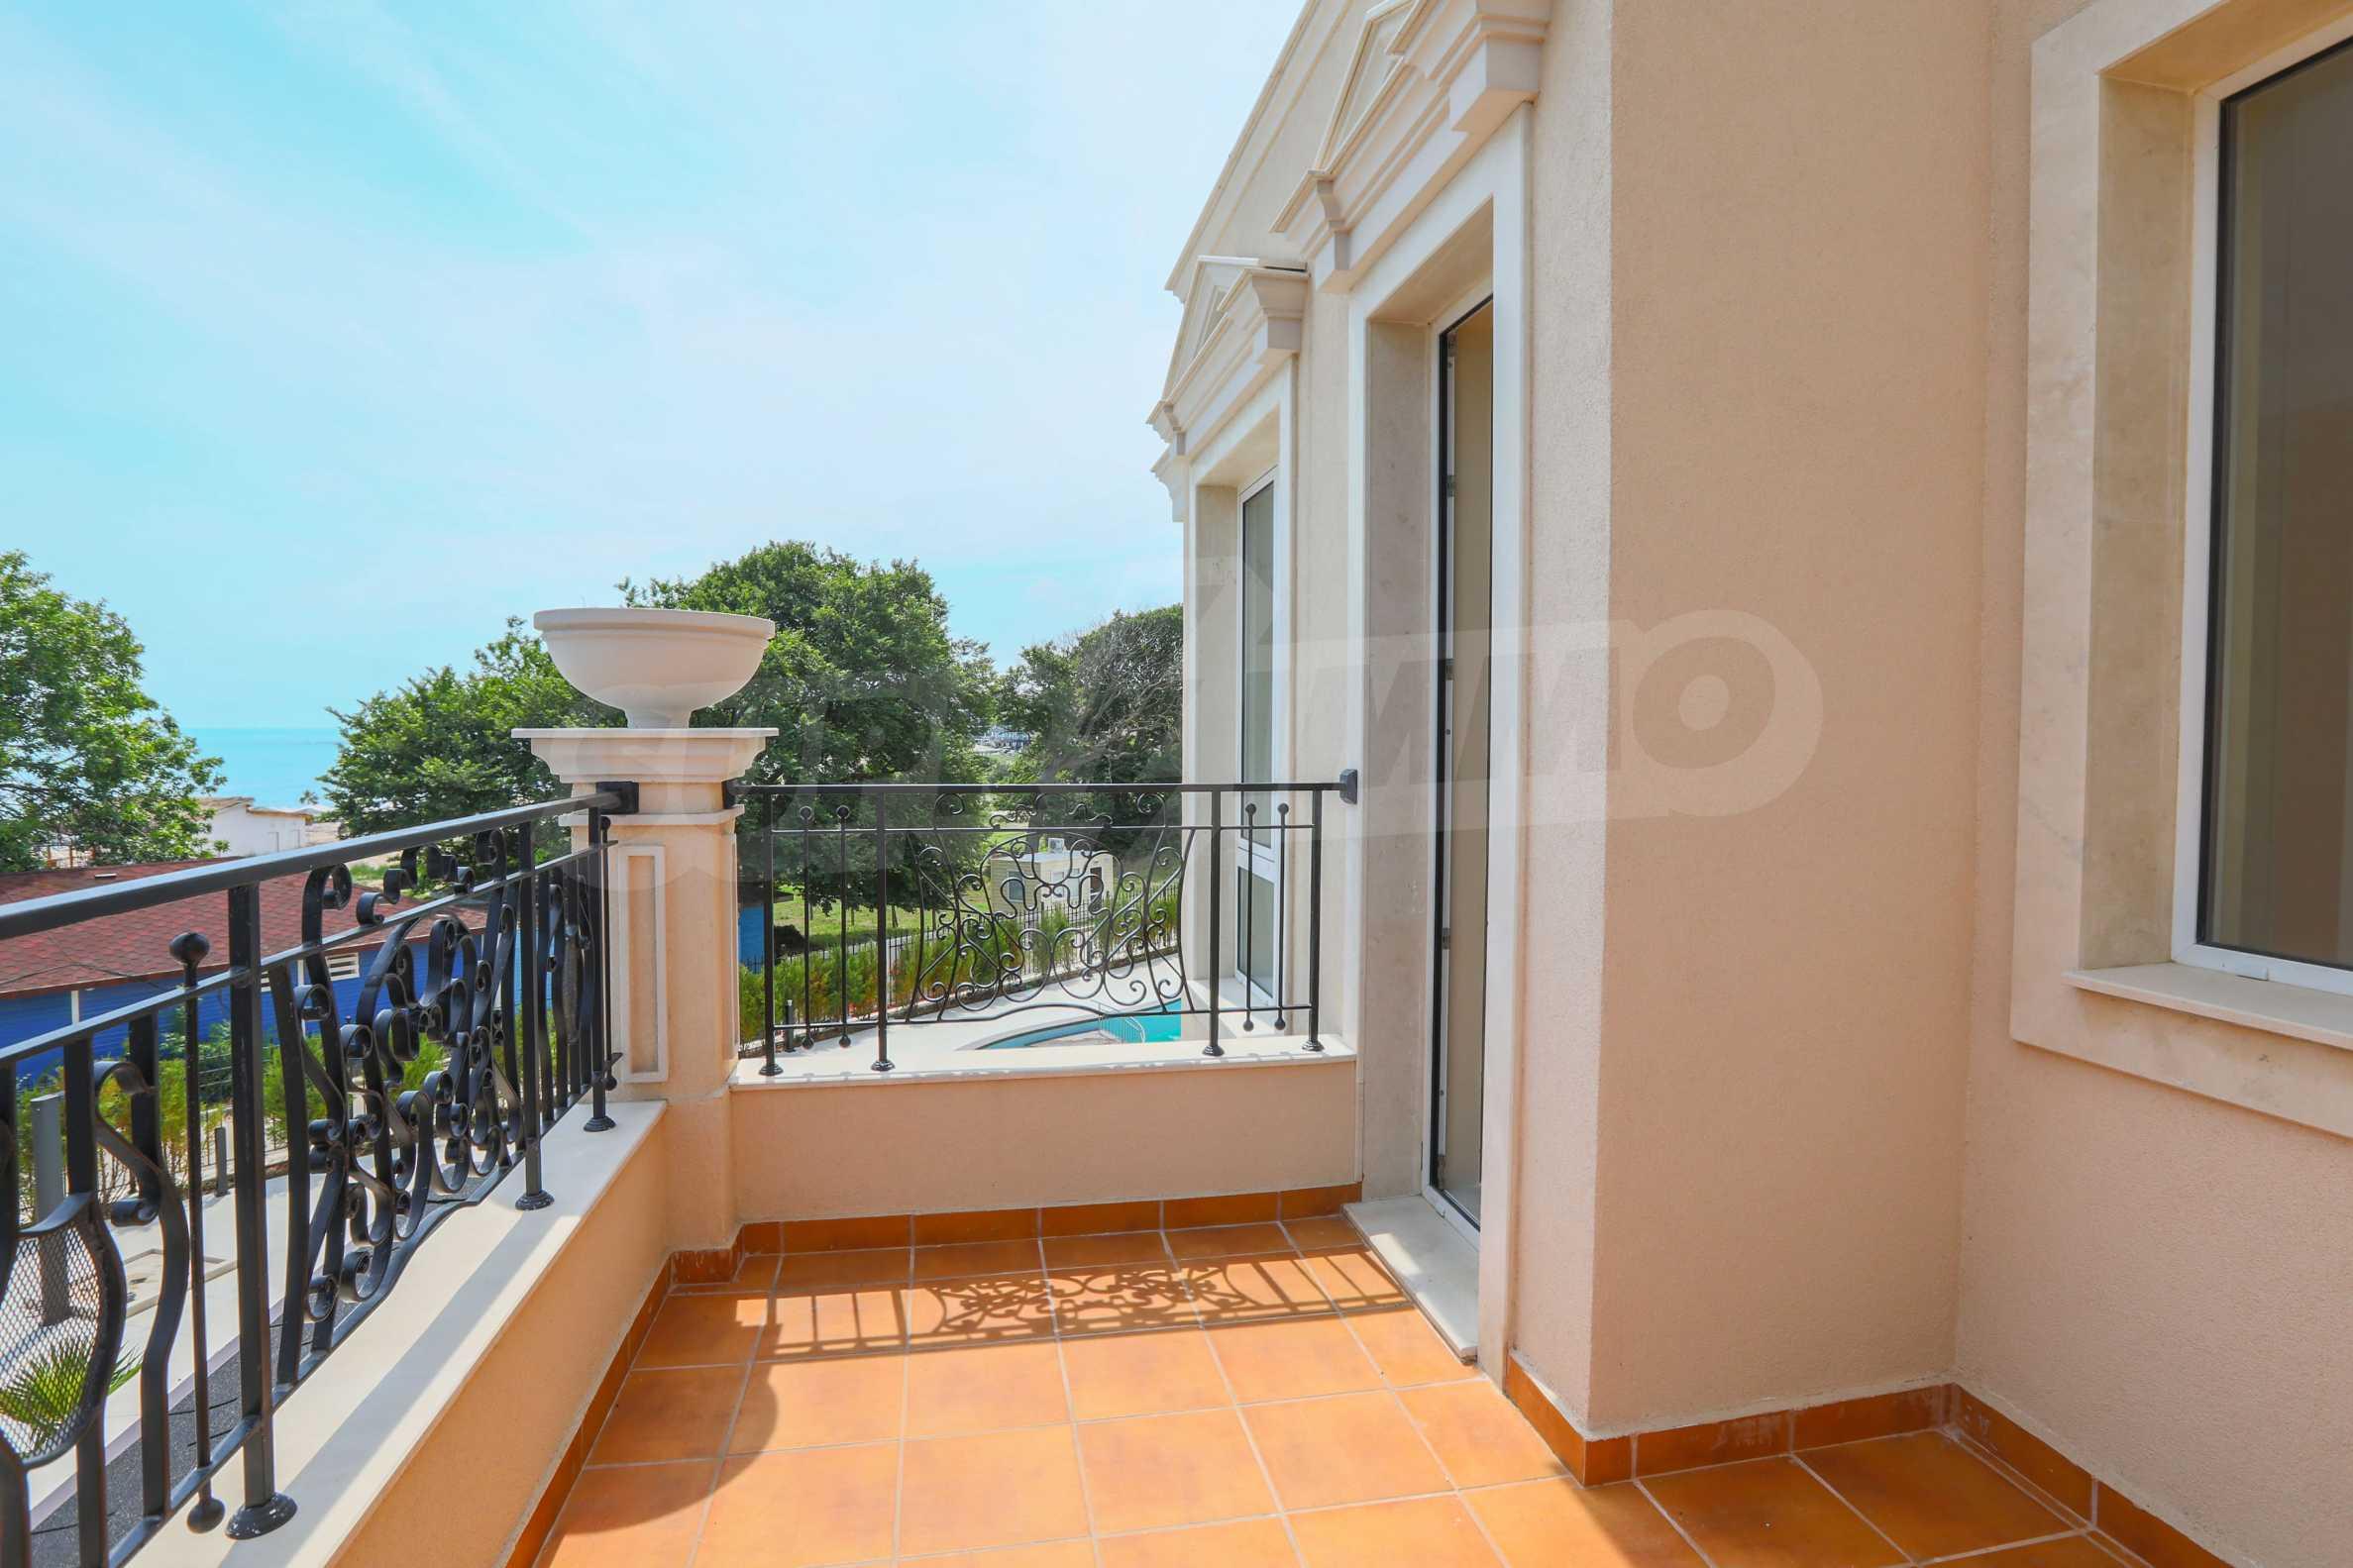 Комфортен двустаен апартамент под наем в Belle Époque Beach Residence, курорт Лозенец 16